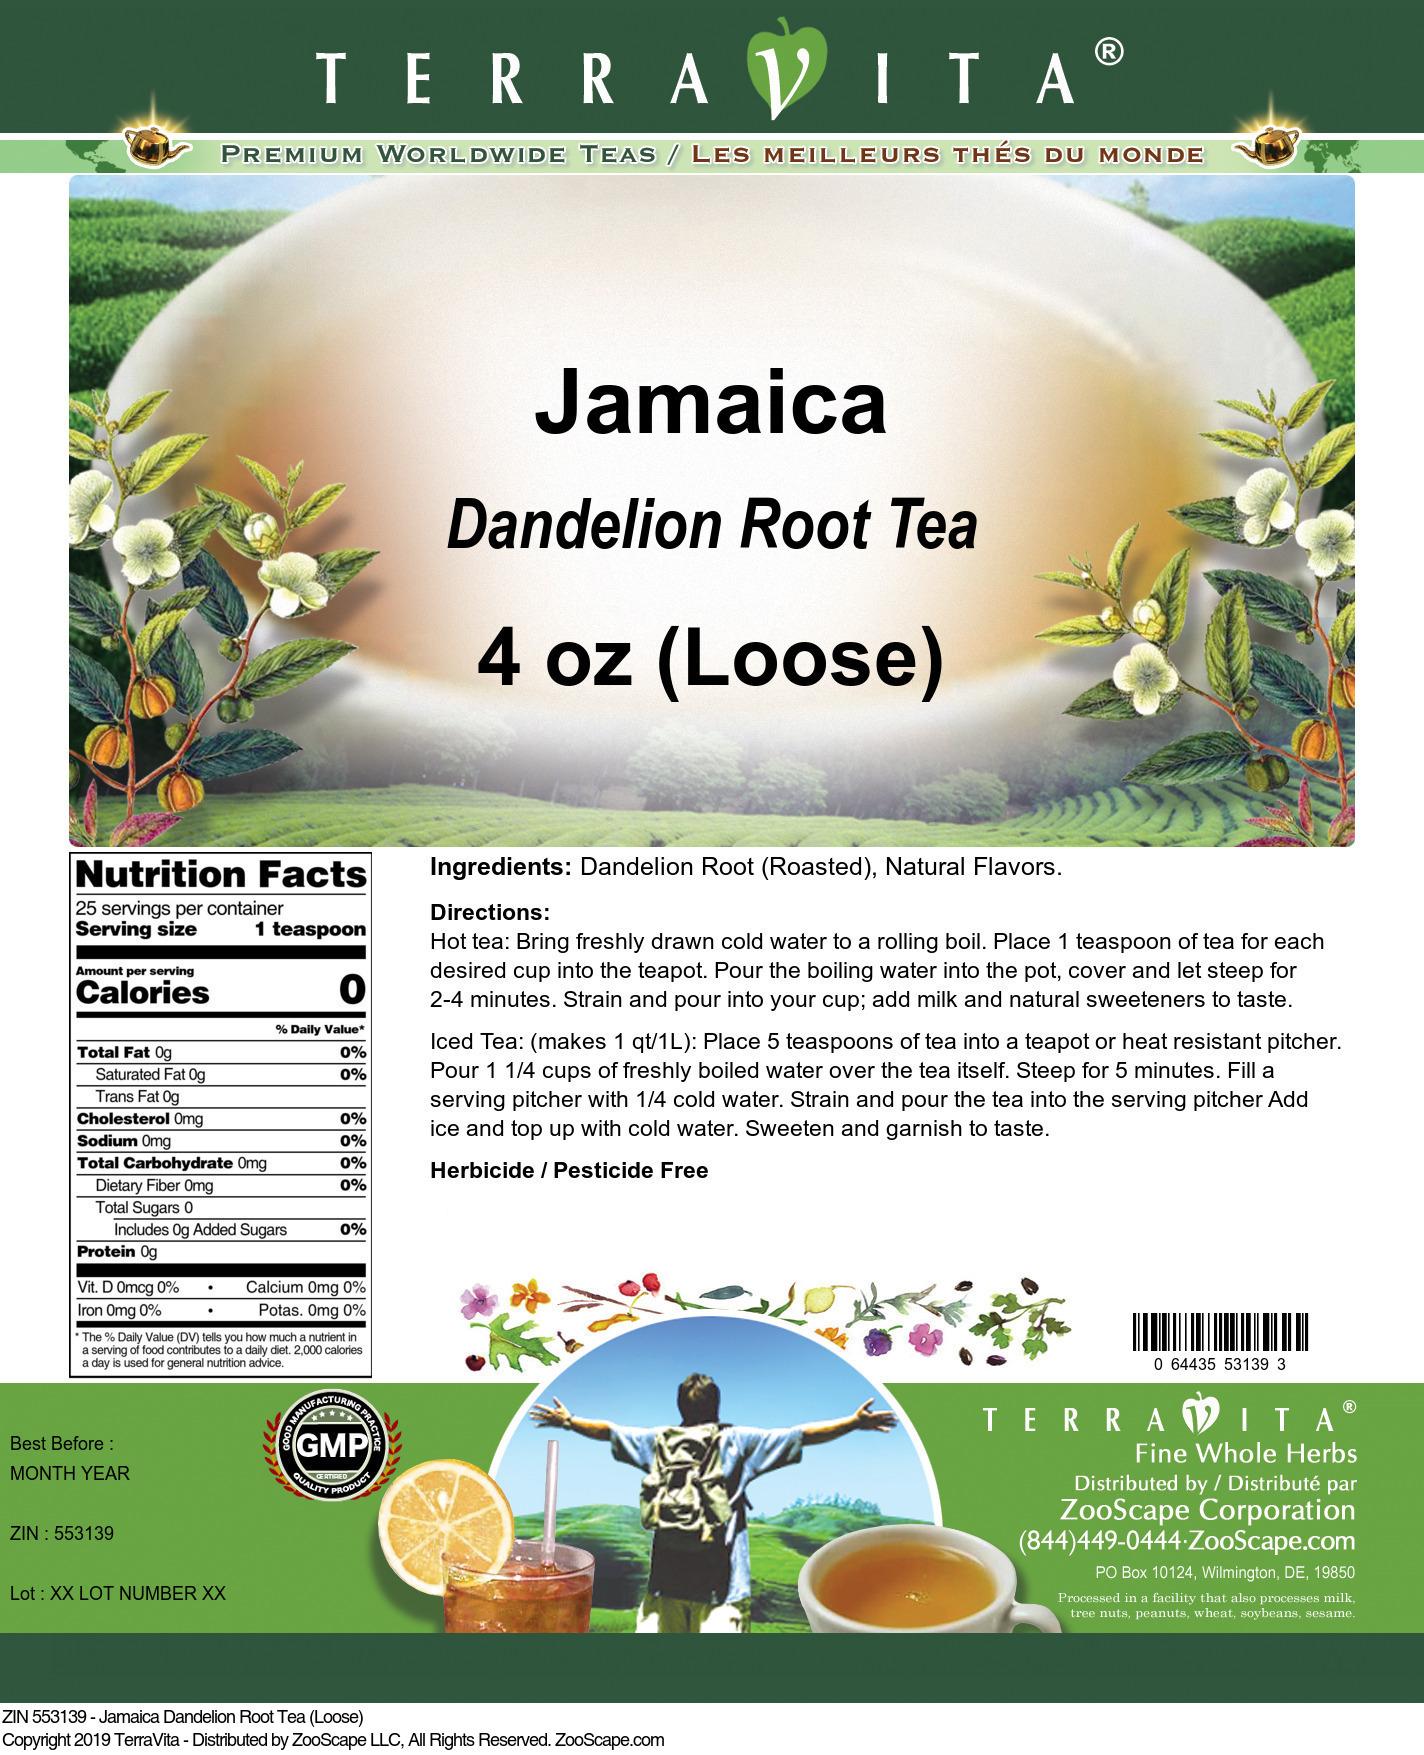 Jamaica Dandelion Root